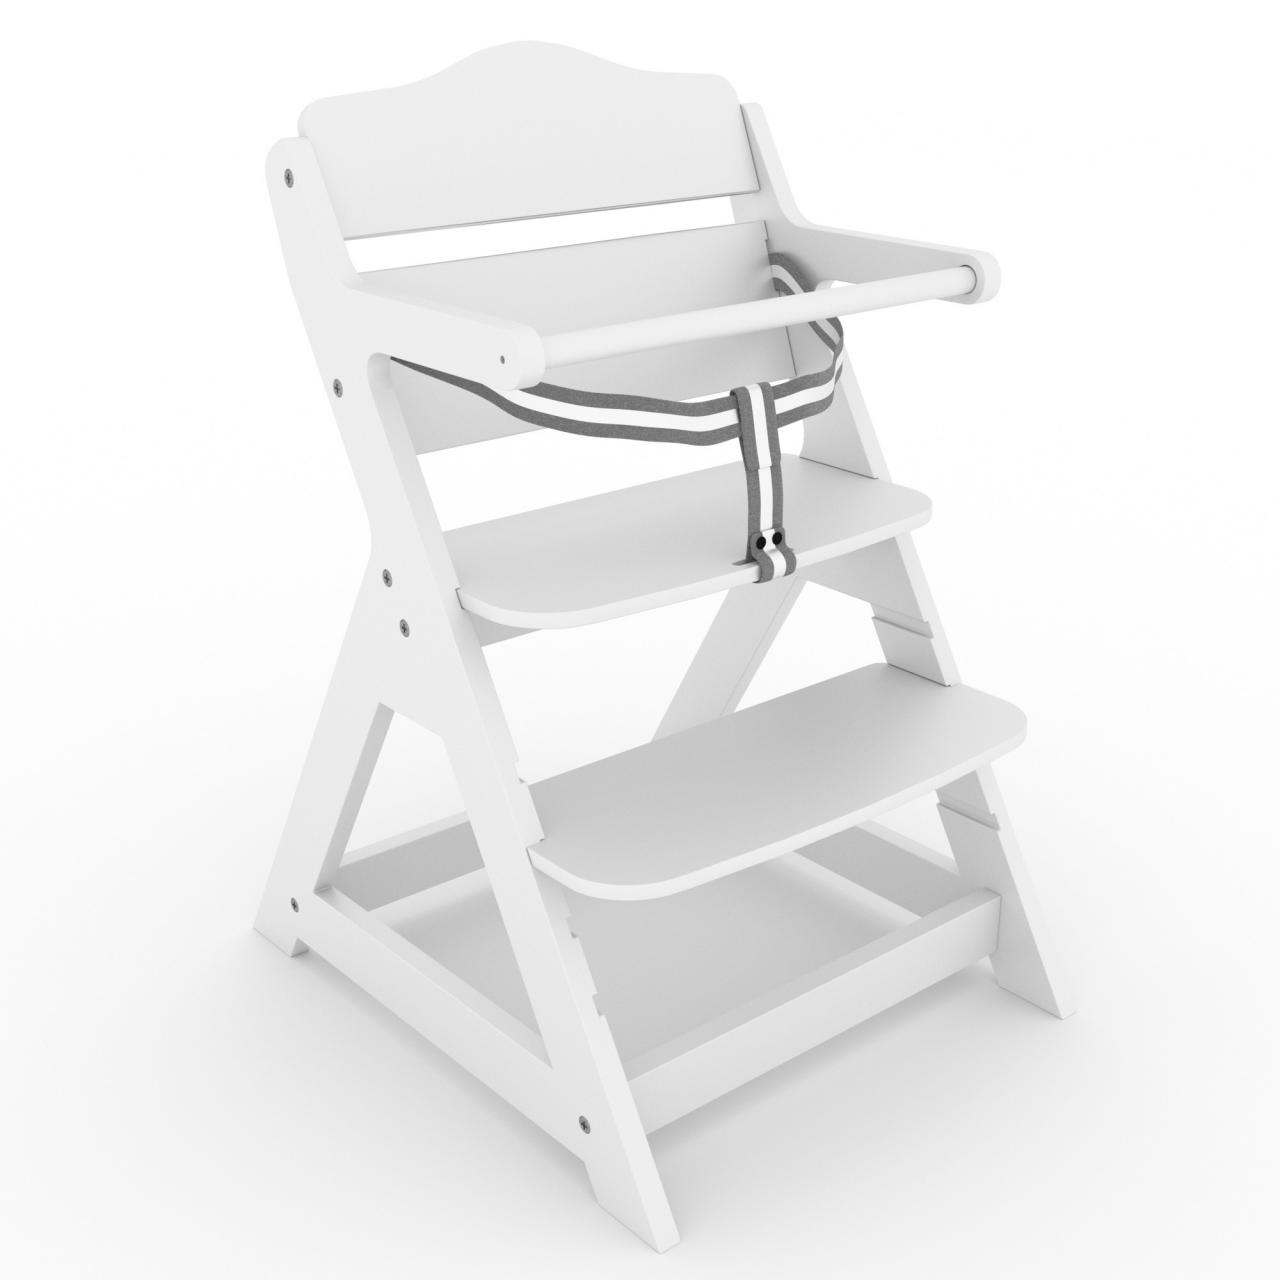 treppenhochstuhl kinderhochstuhl holz hochstuhl kinderstuhl babyhochstuhl stuhl ebay. Black Bedroom Furniture Sets. Home Design Ideas